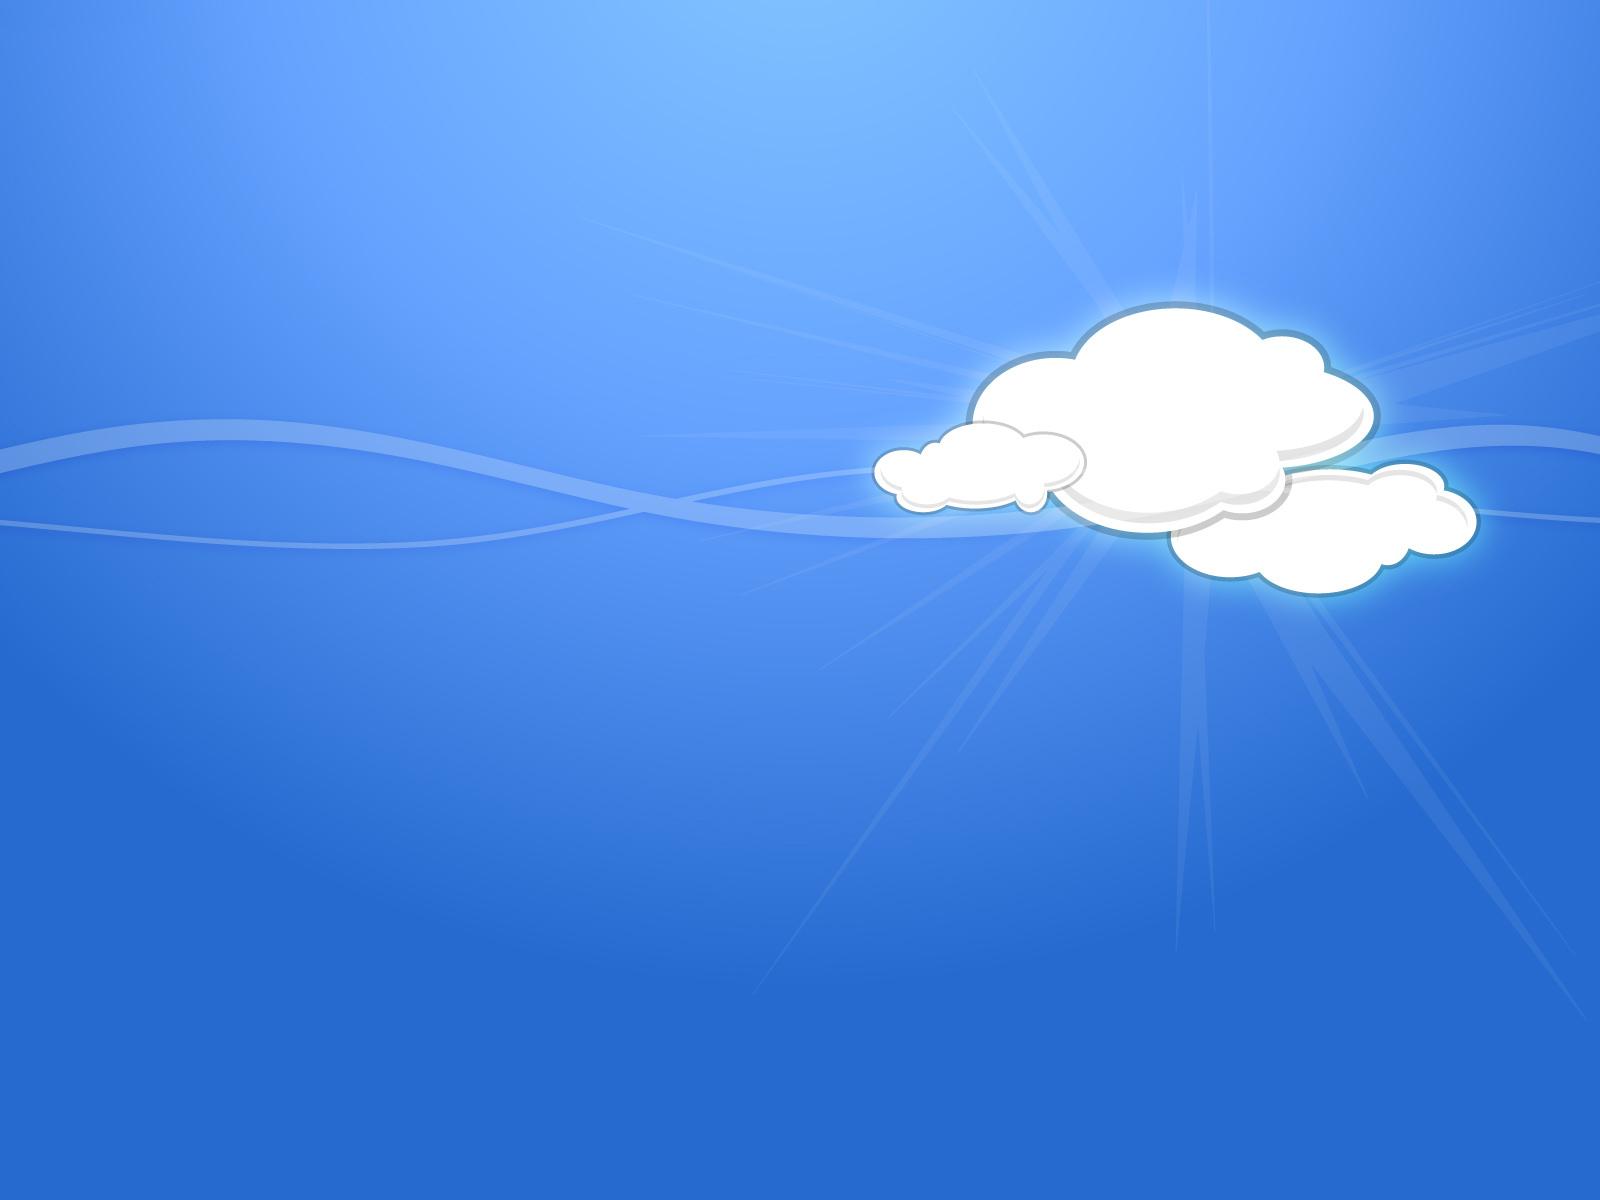 Simple Sky Cloud HD Wallpaper Simple Sky Cloud Wallpapers for Desktop 1600x1200